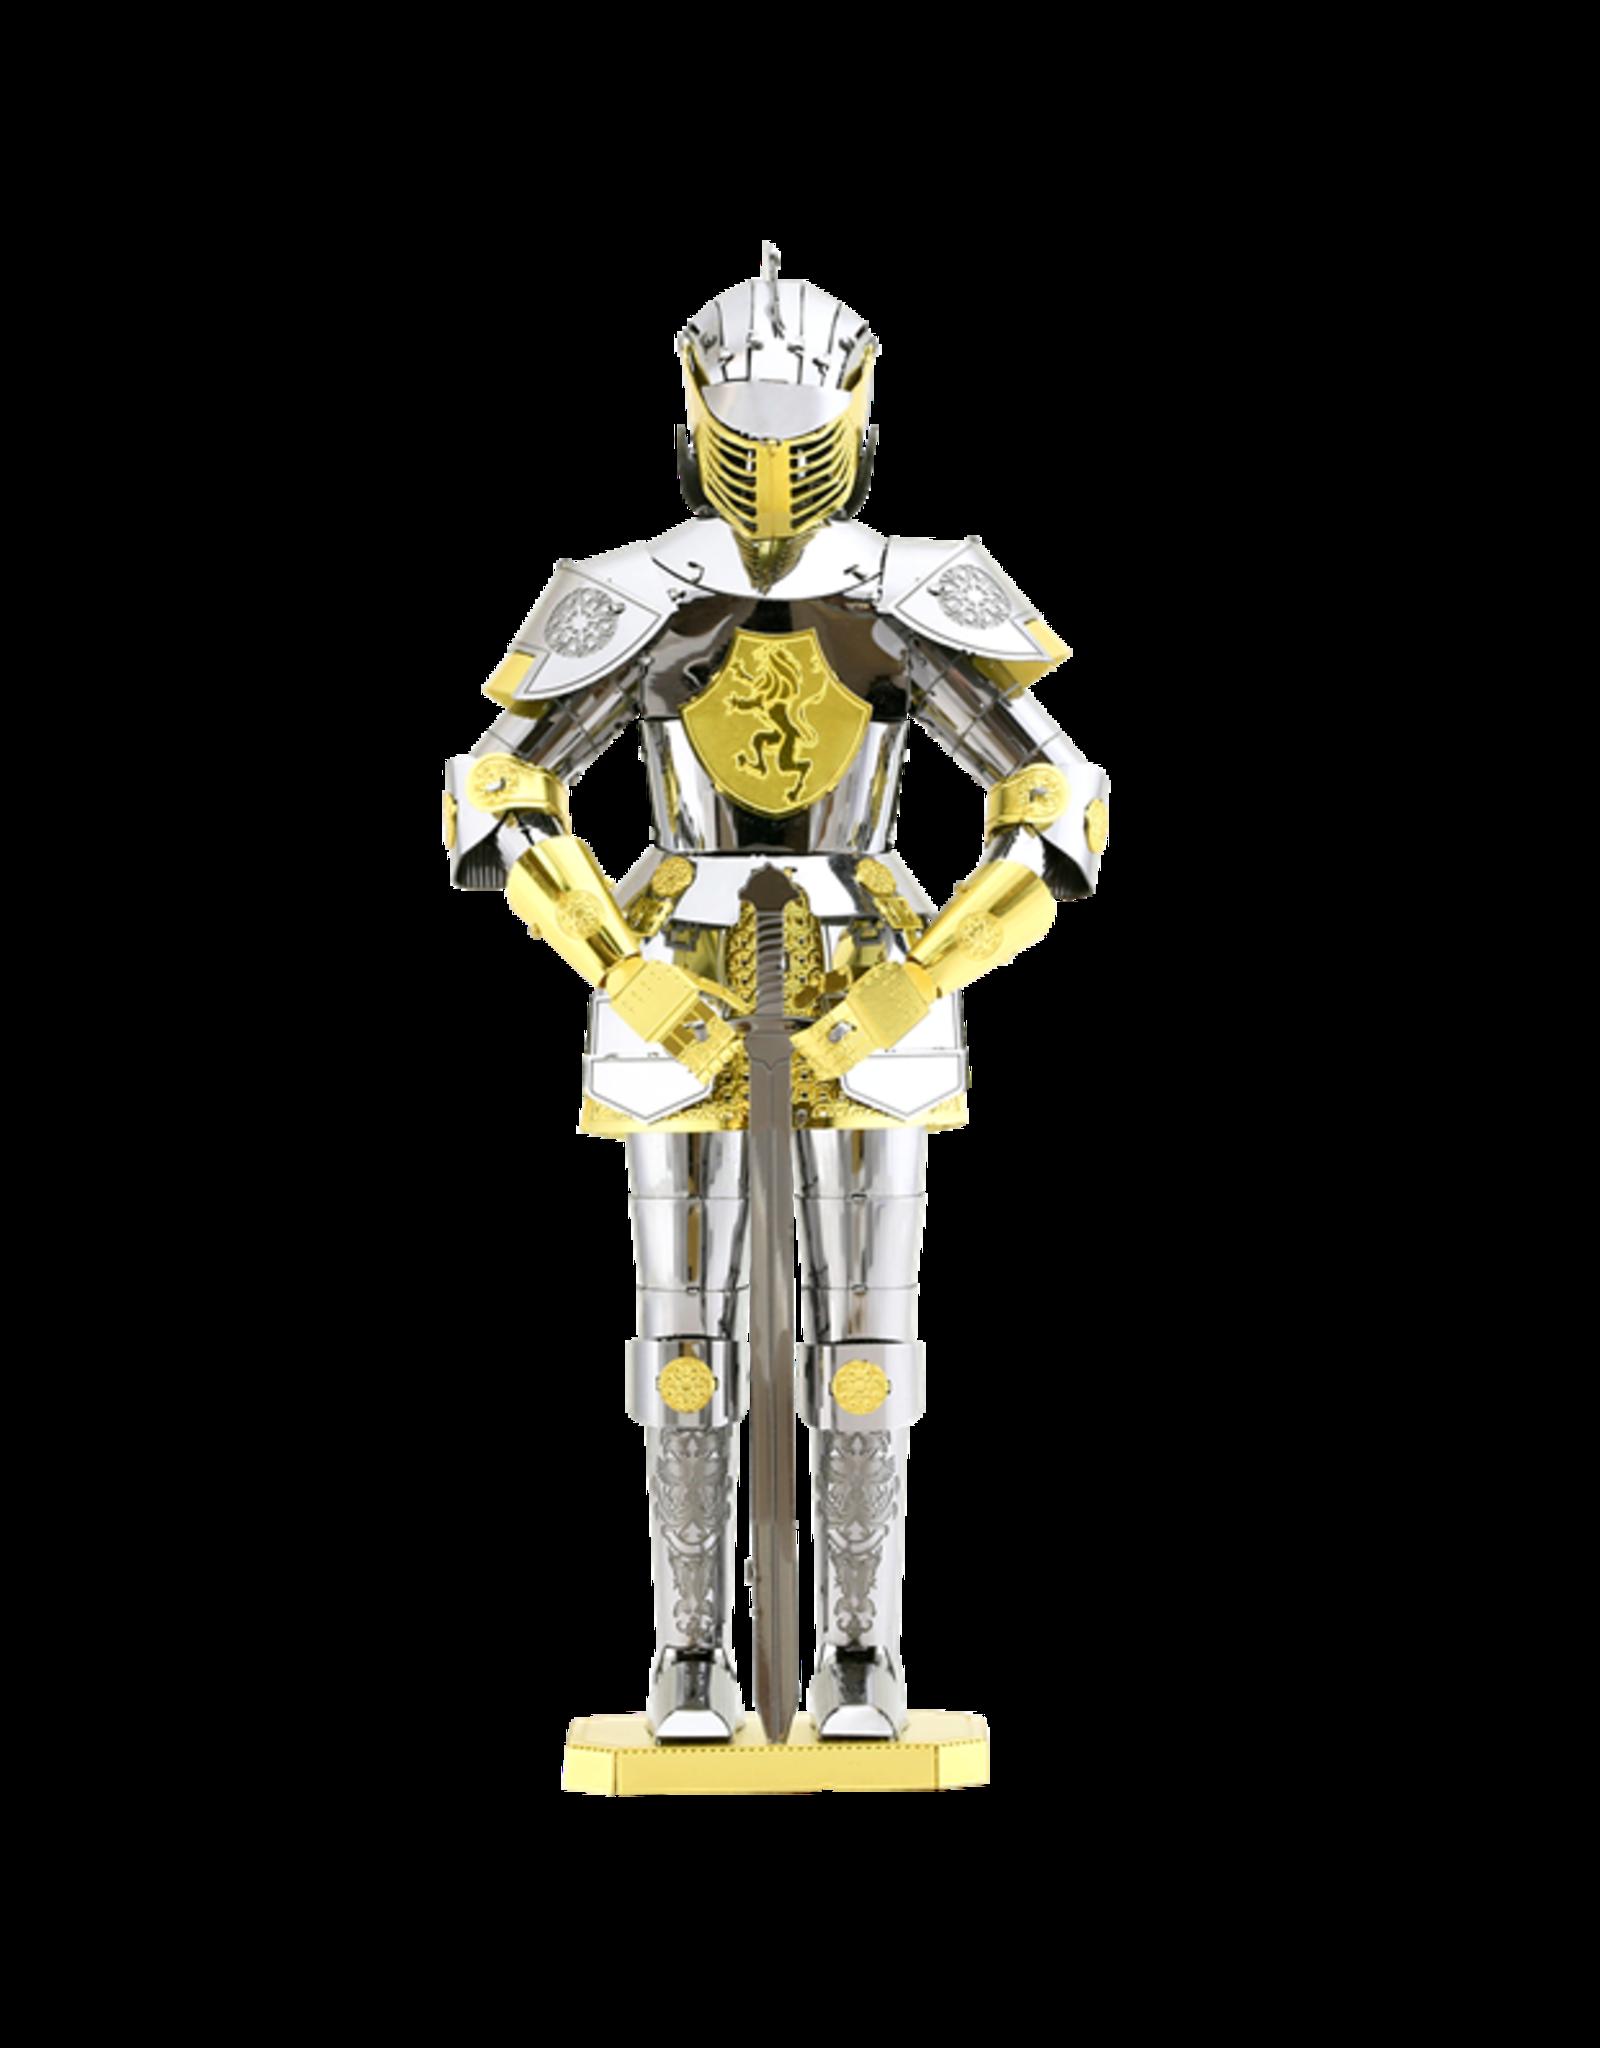 Metal Earth Metal Earth Suits of Armor